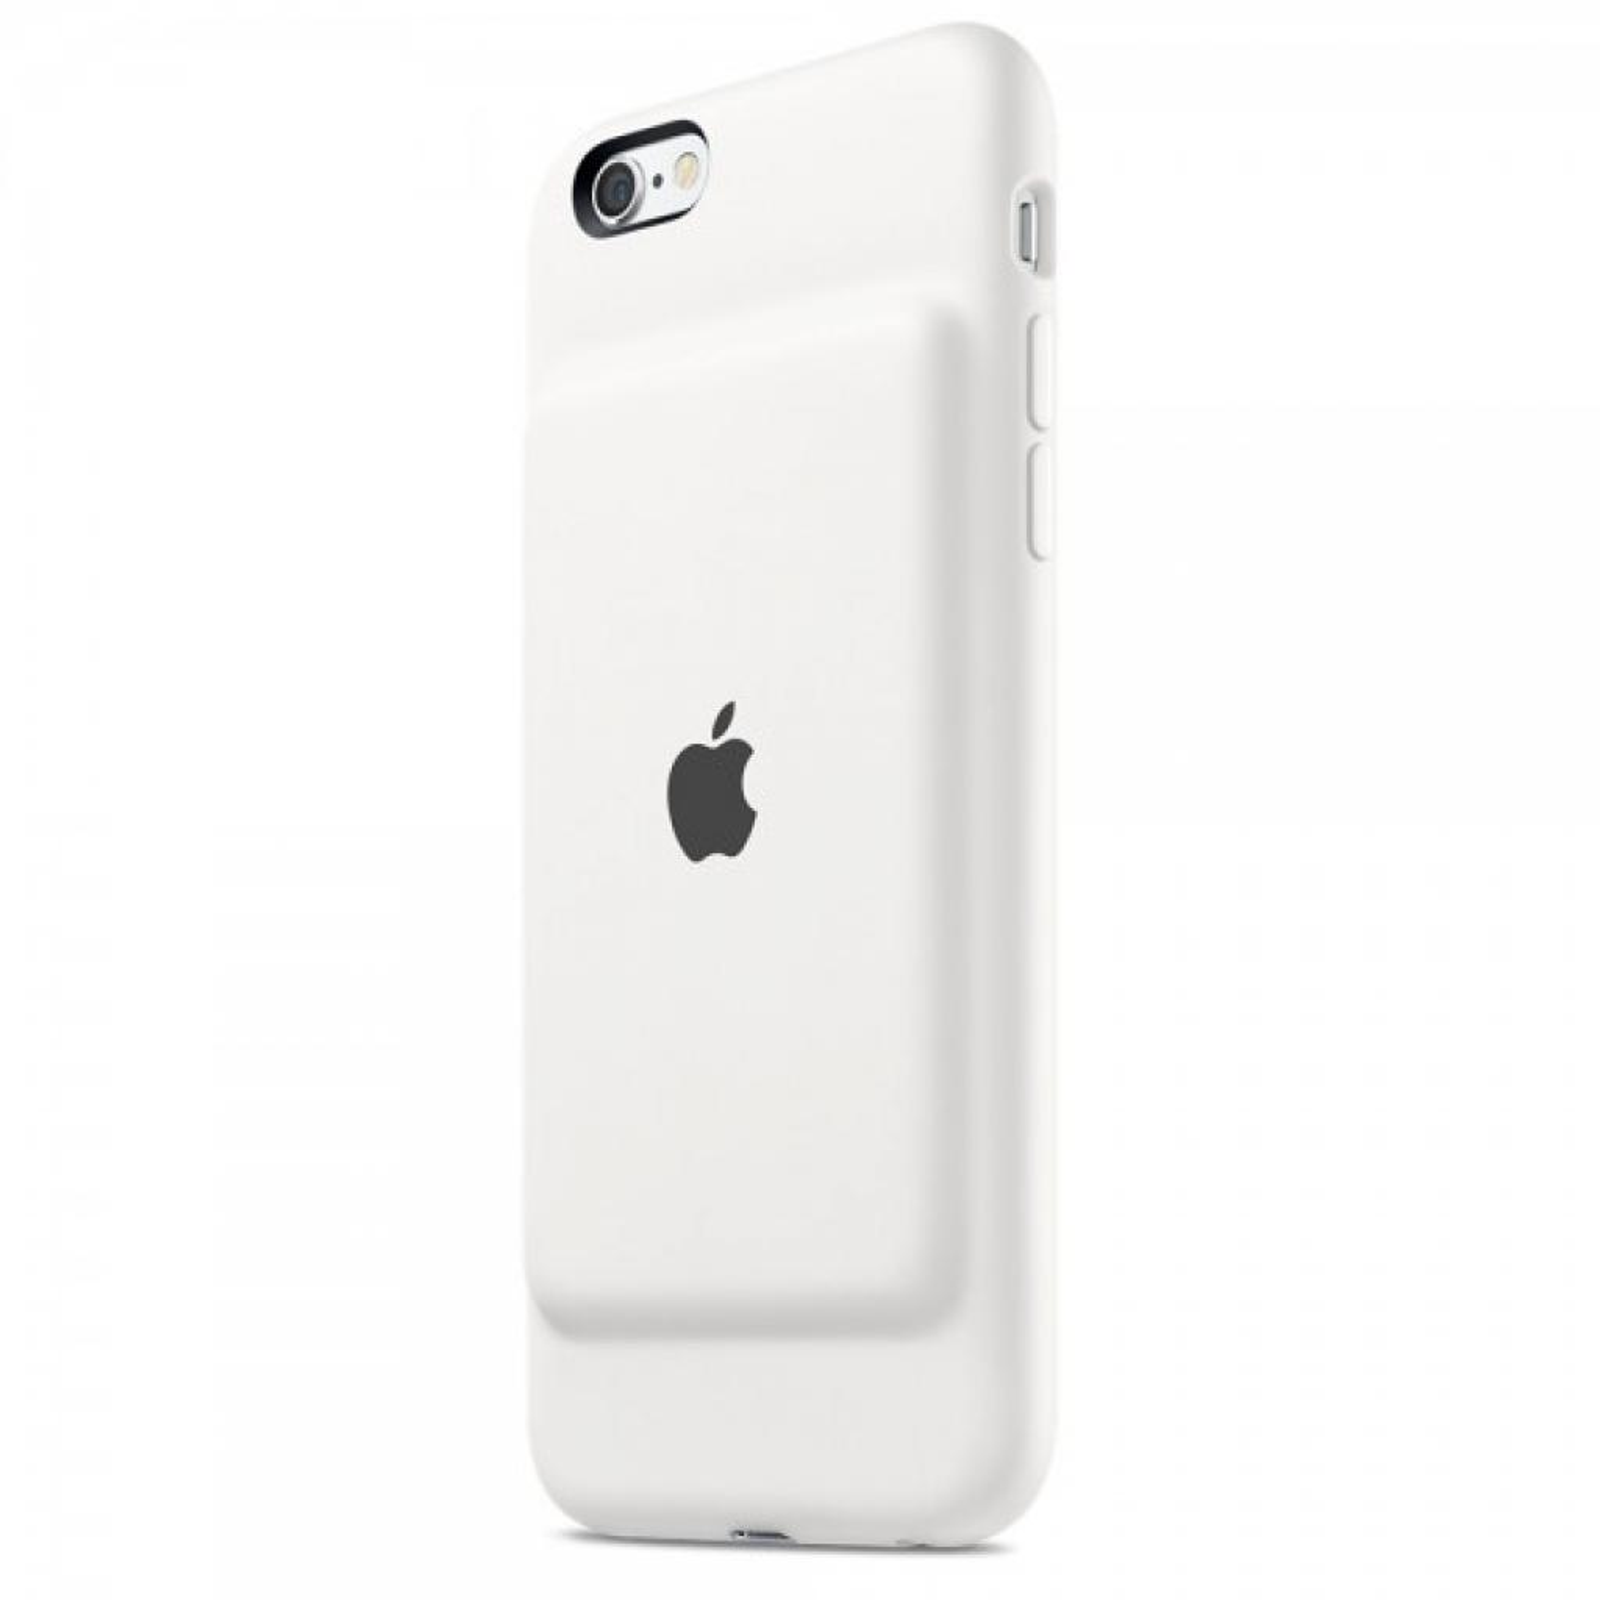 Чехол для моб. телефона Apple Smart Battery Case для iPhone 6/6s White (MGQM2ZM/A) изображение 2